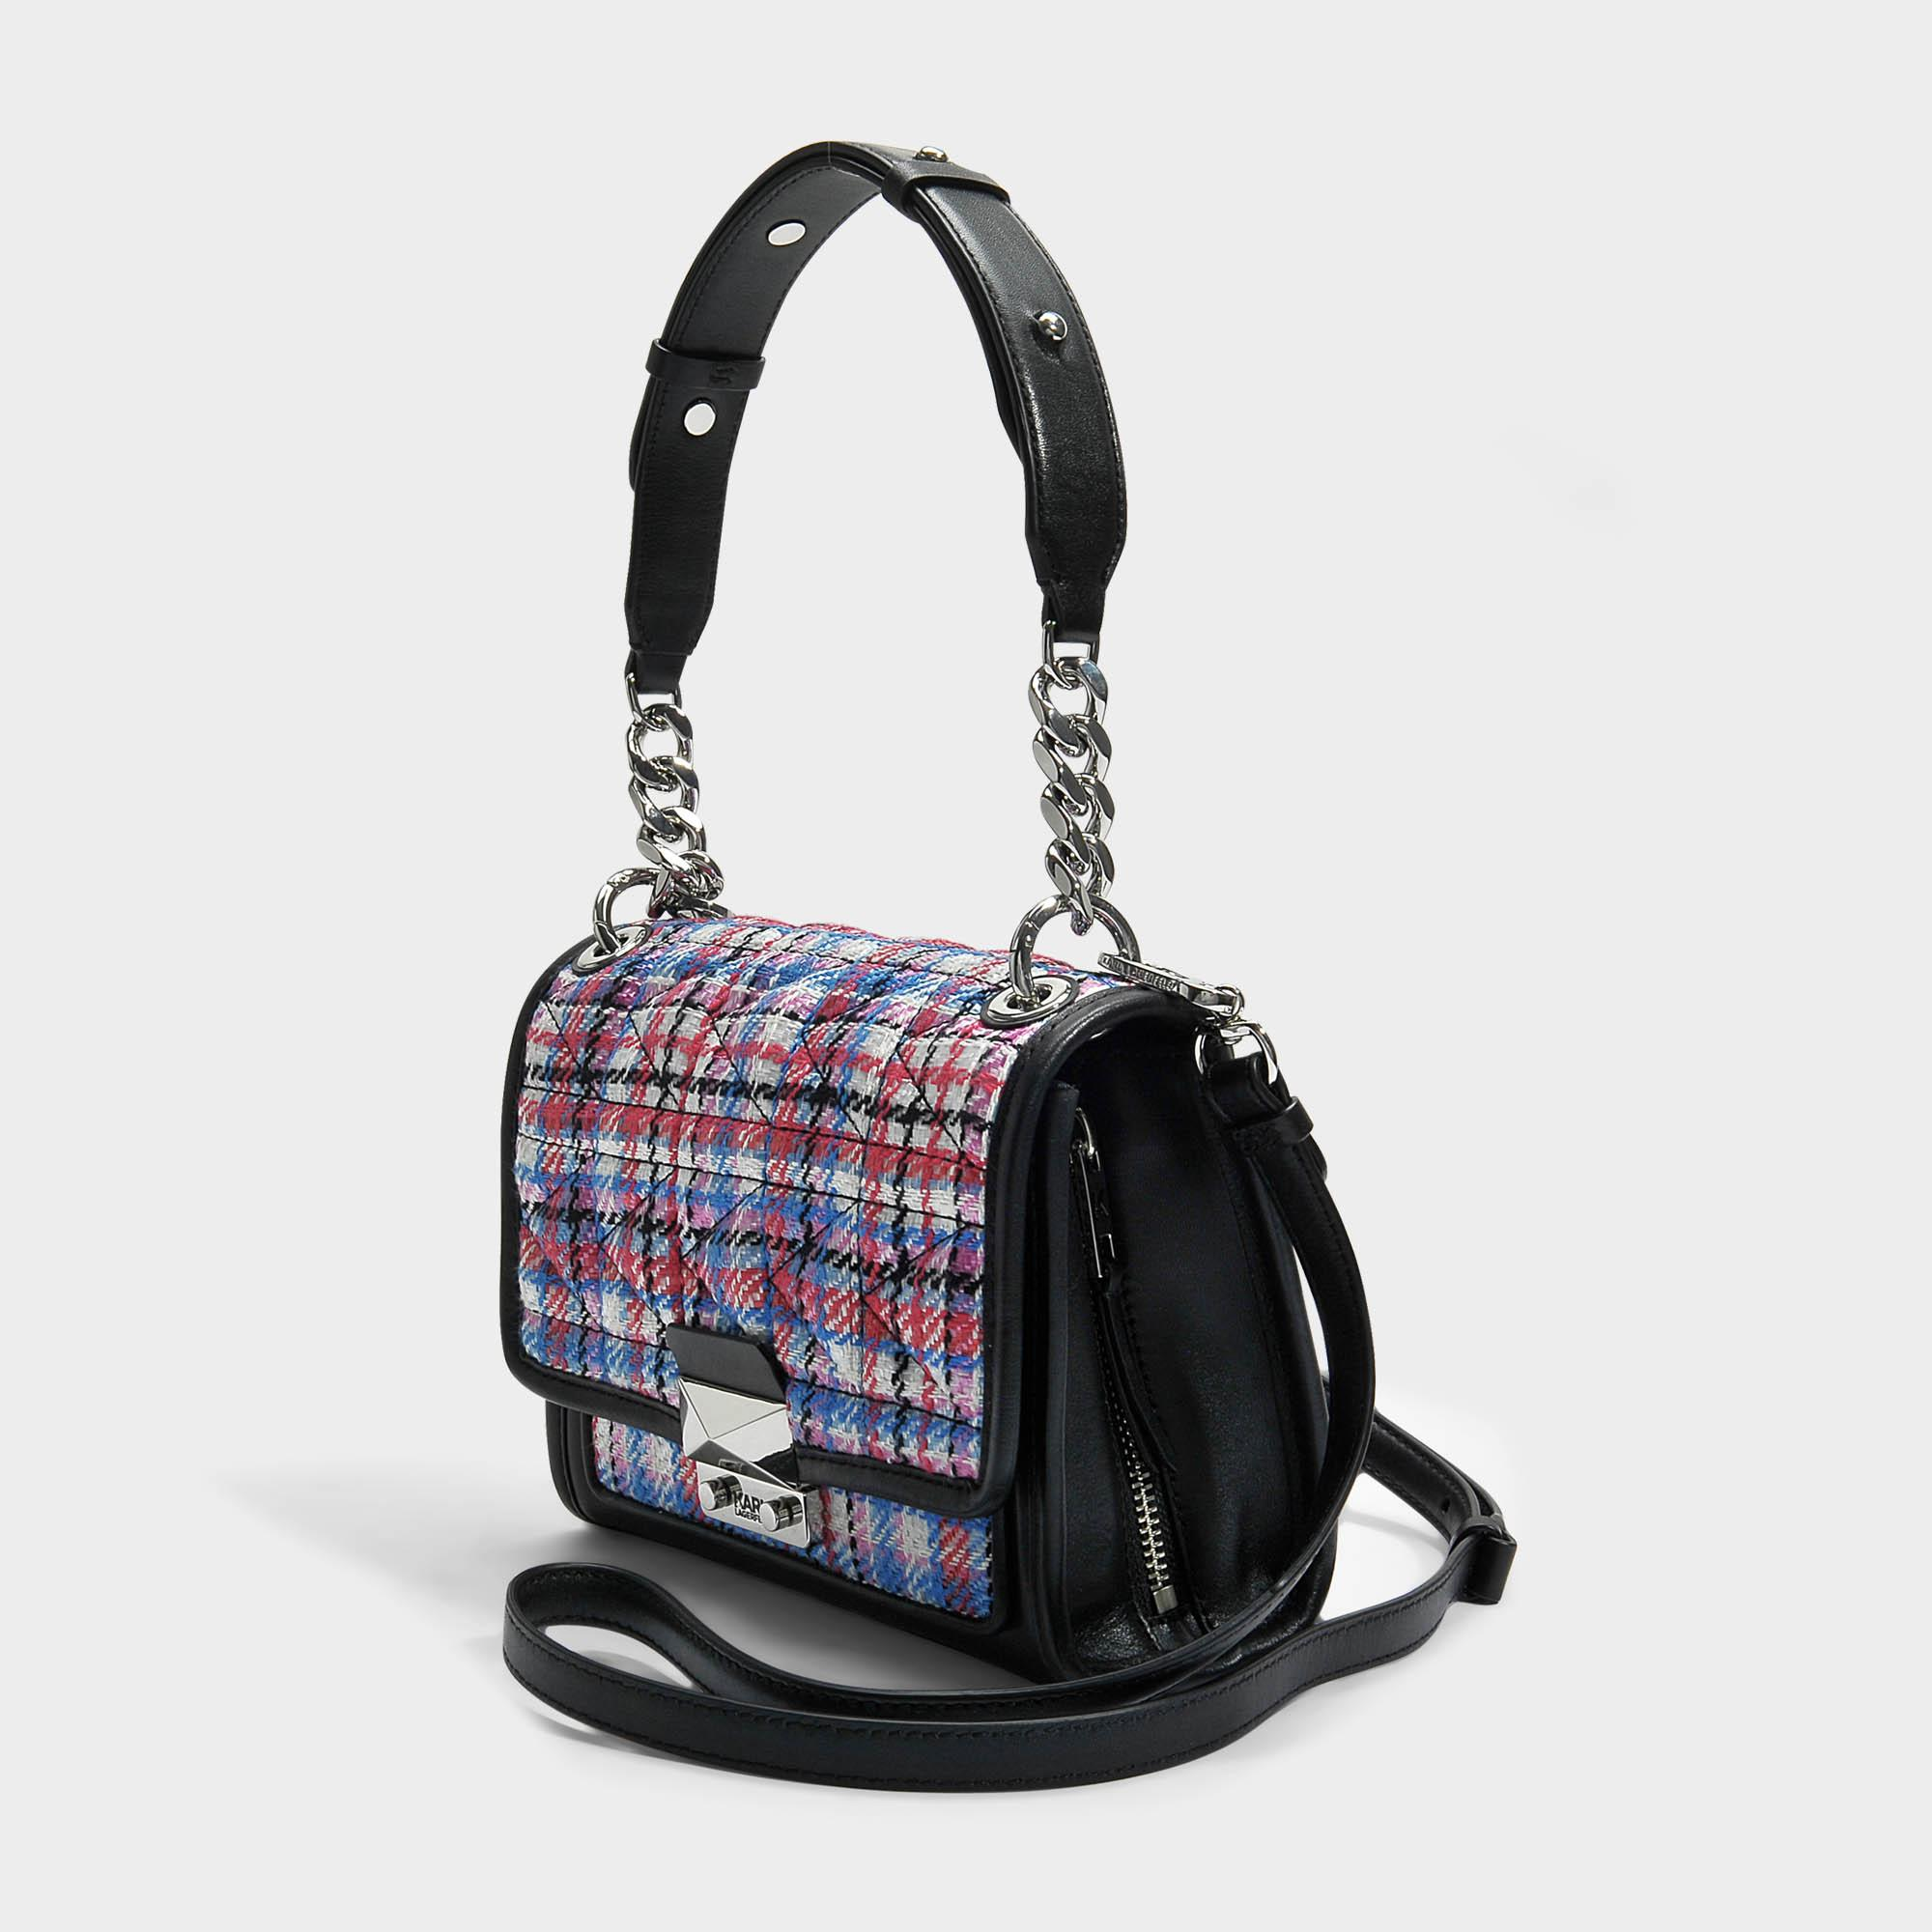 K/Kuilted Tweed Effect Raffia Mini Tote Bag in Multicolour Calf and Raffia Karl Lagerfeld yYdPg4ScAk